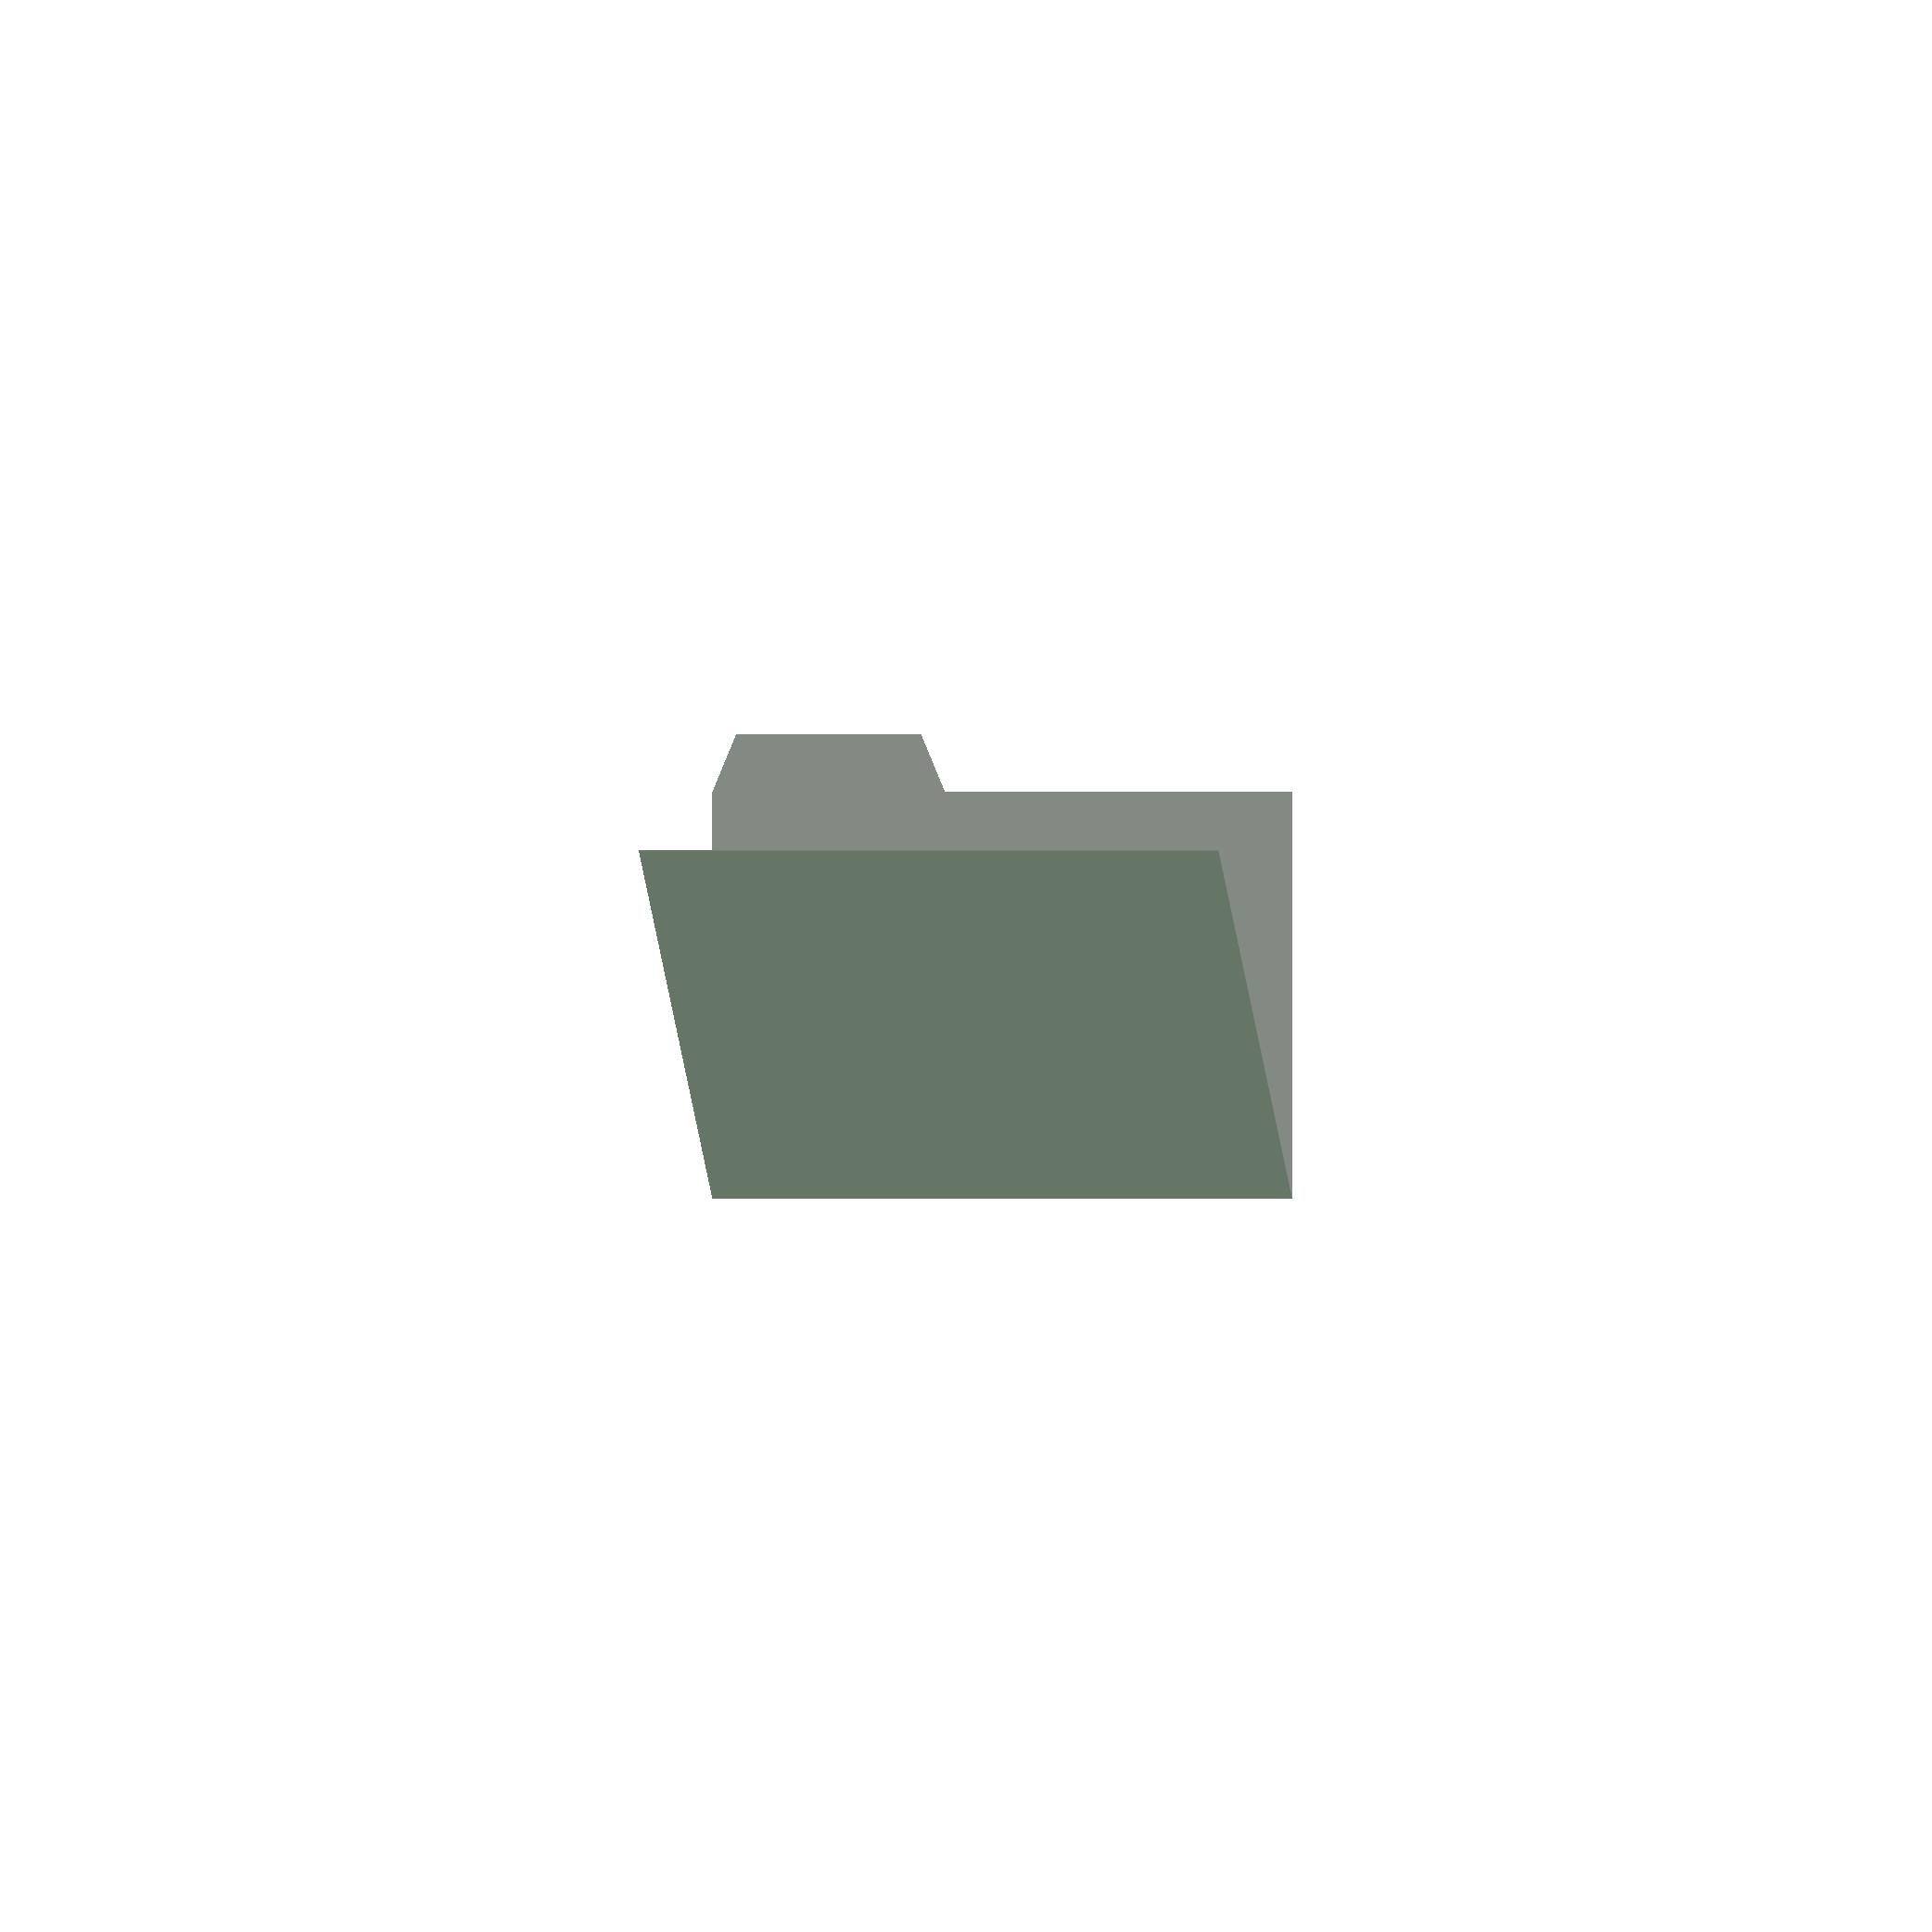 process icons_Folder.png